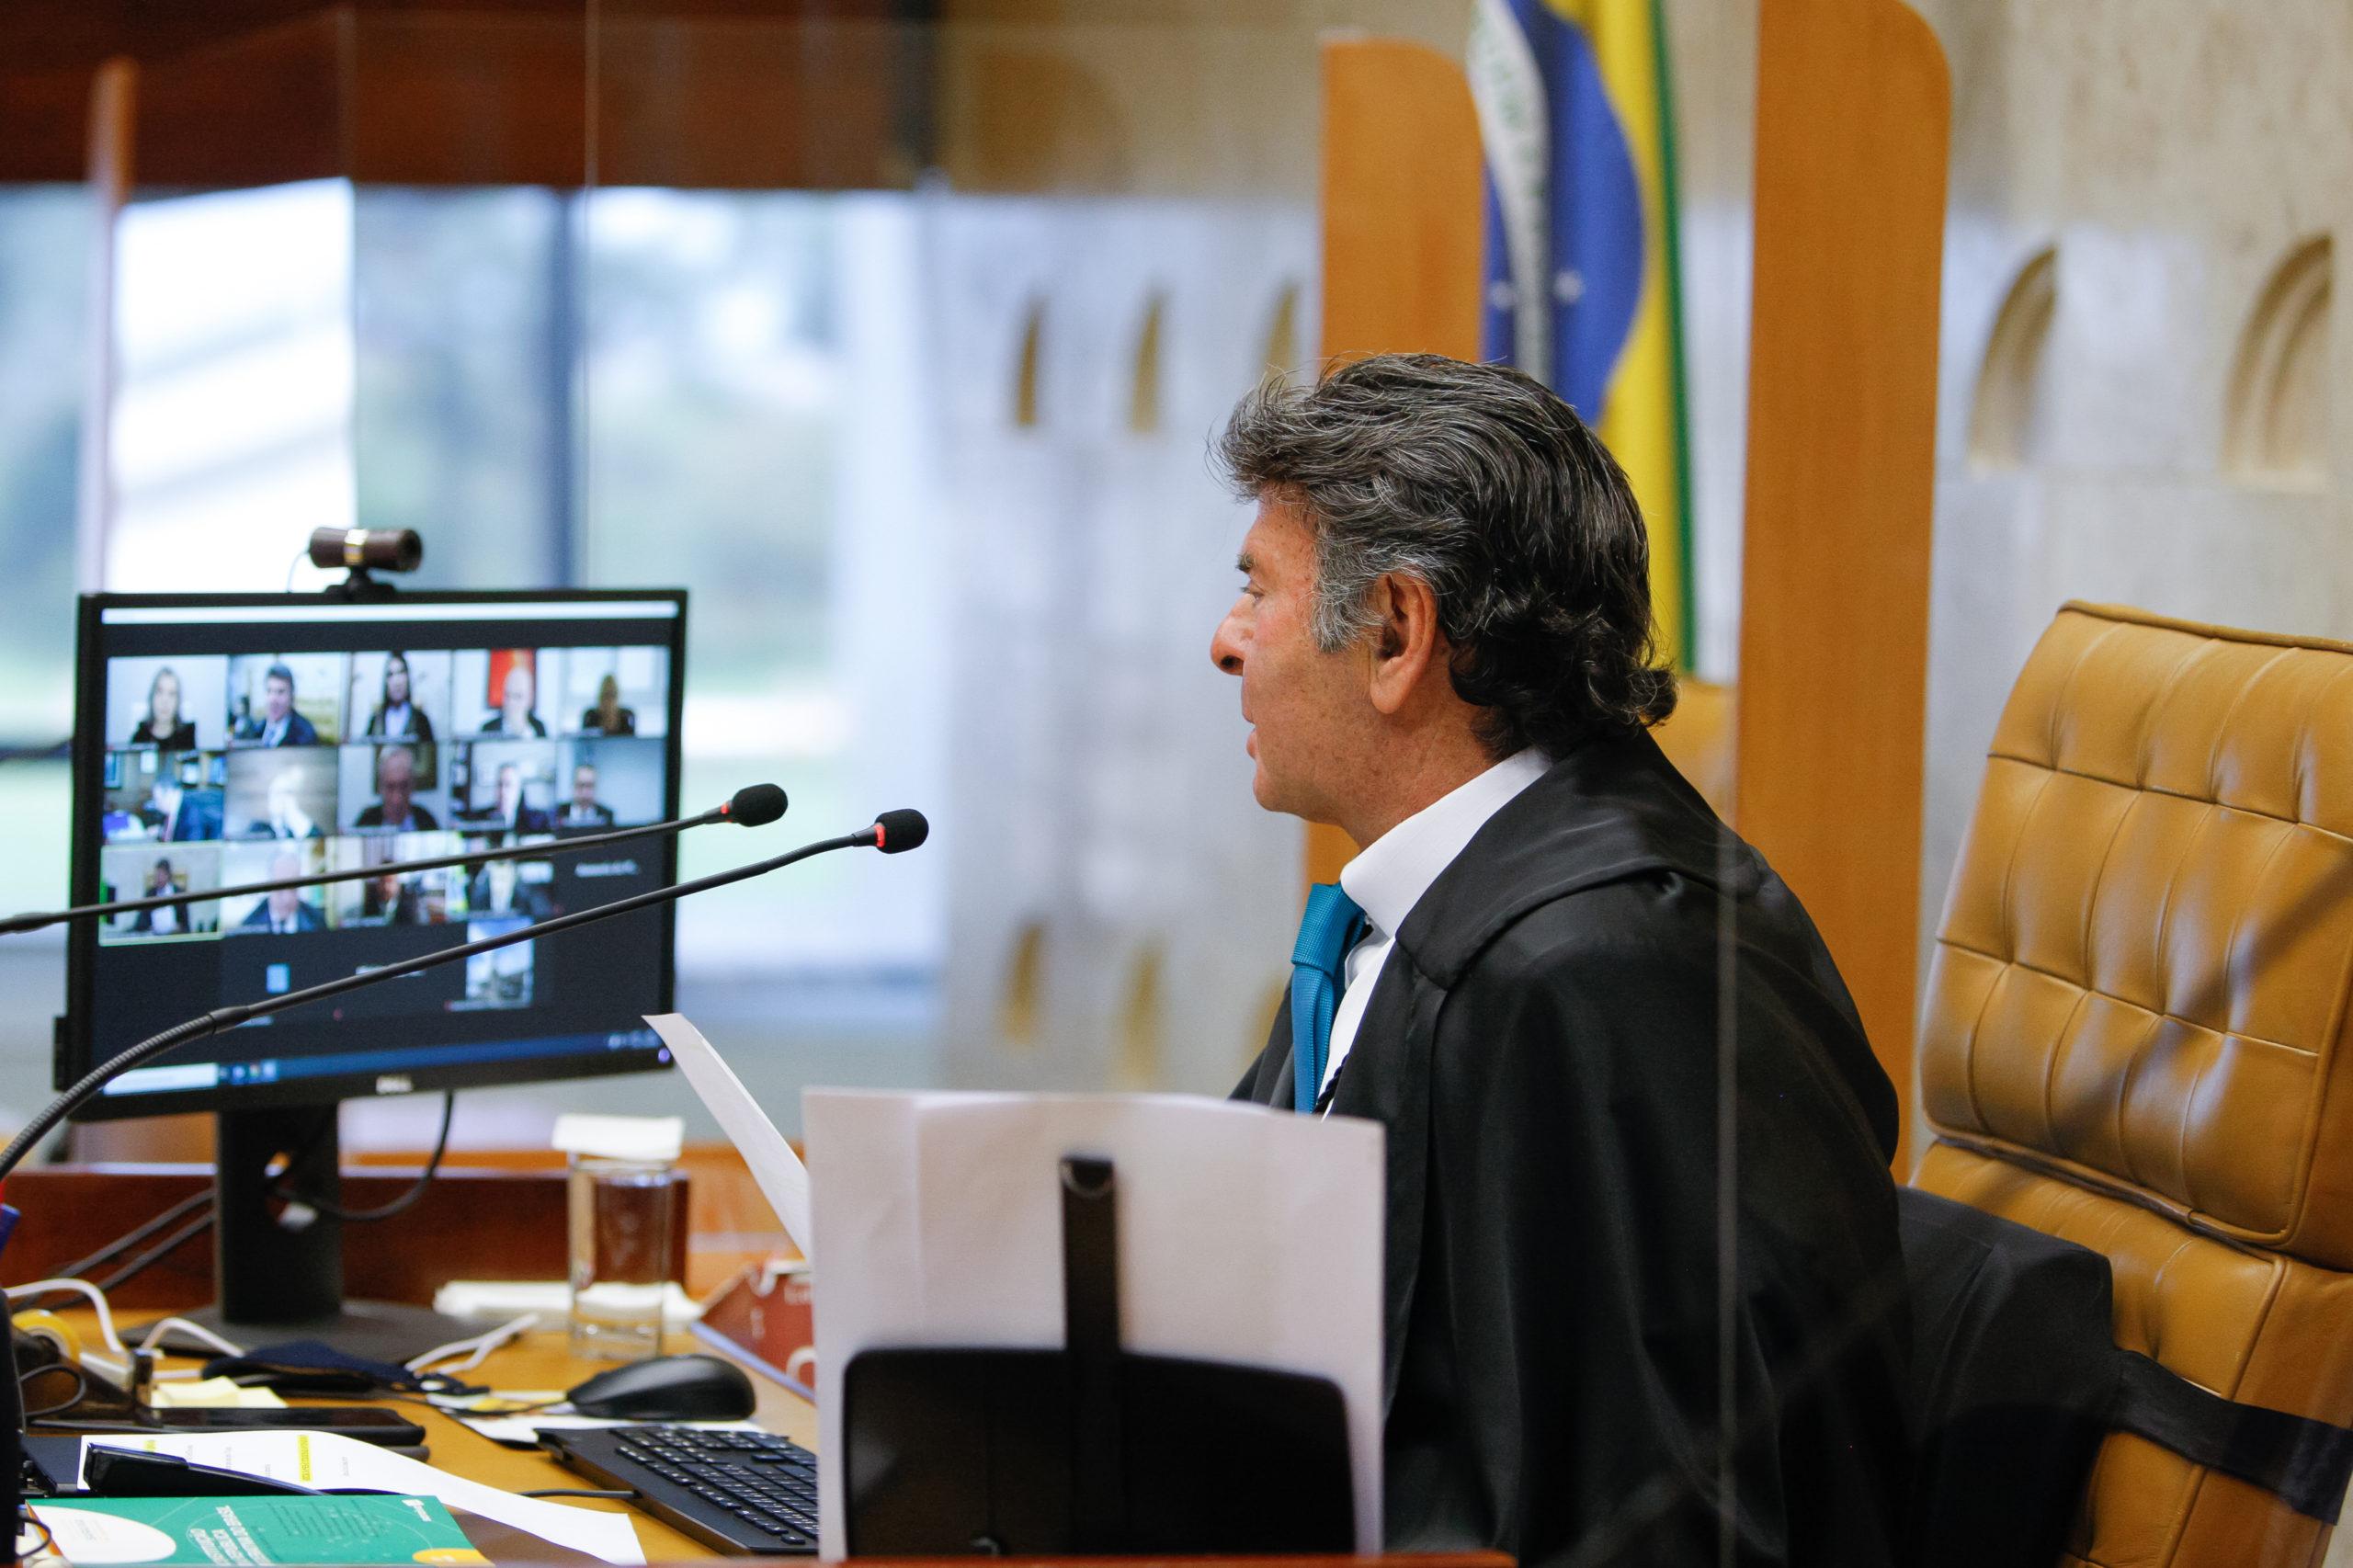 Fux antecipa julgamento sobre CPI da Pandemia